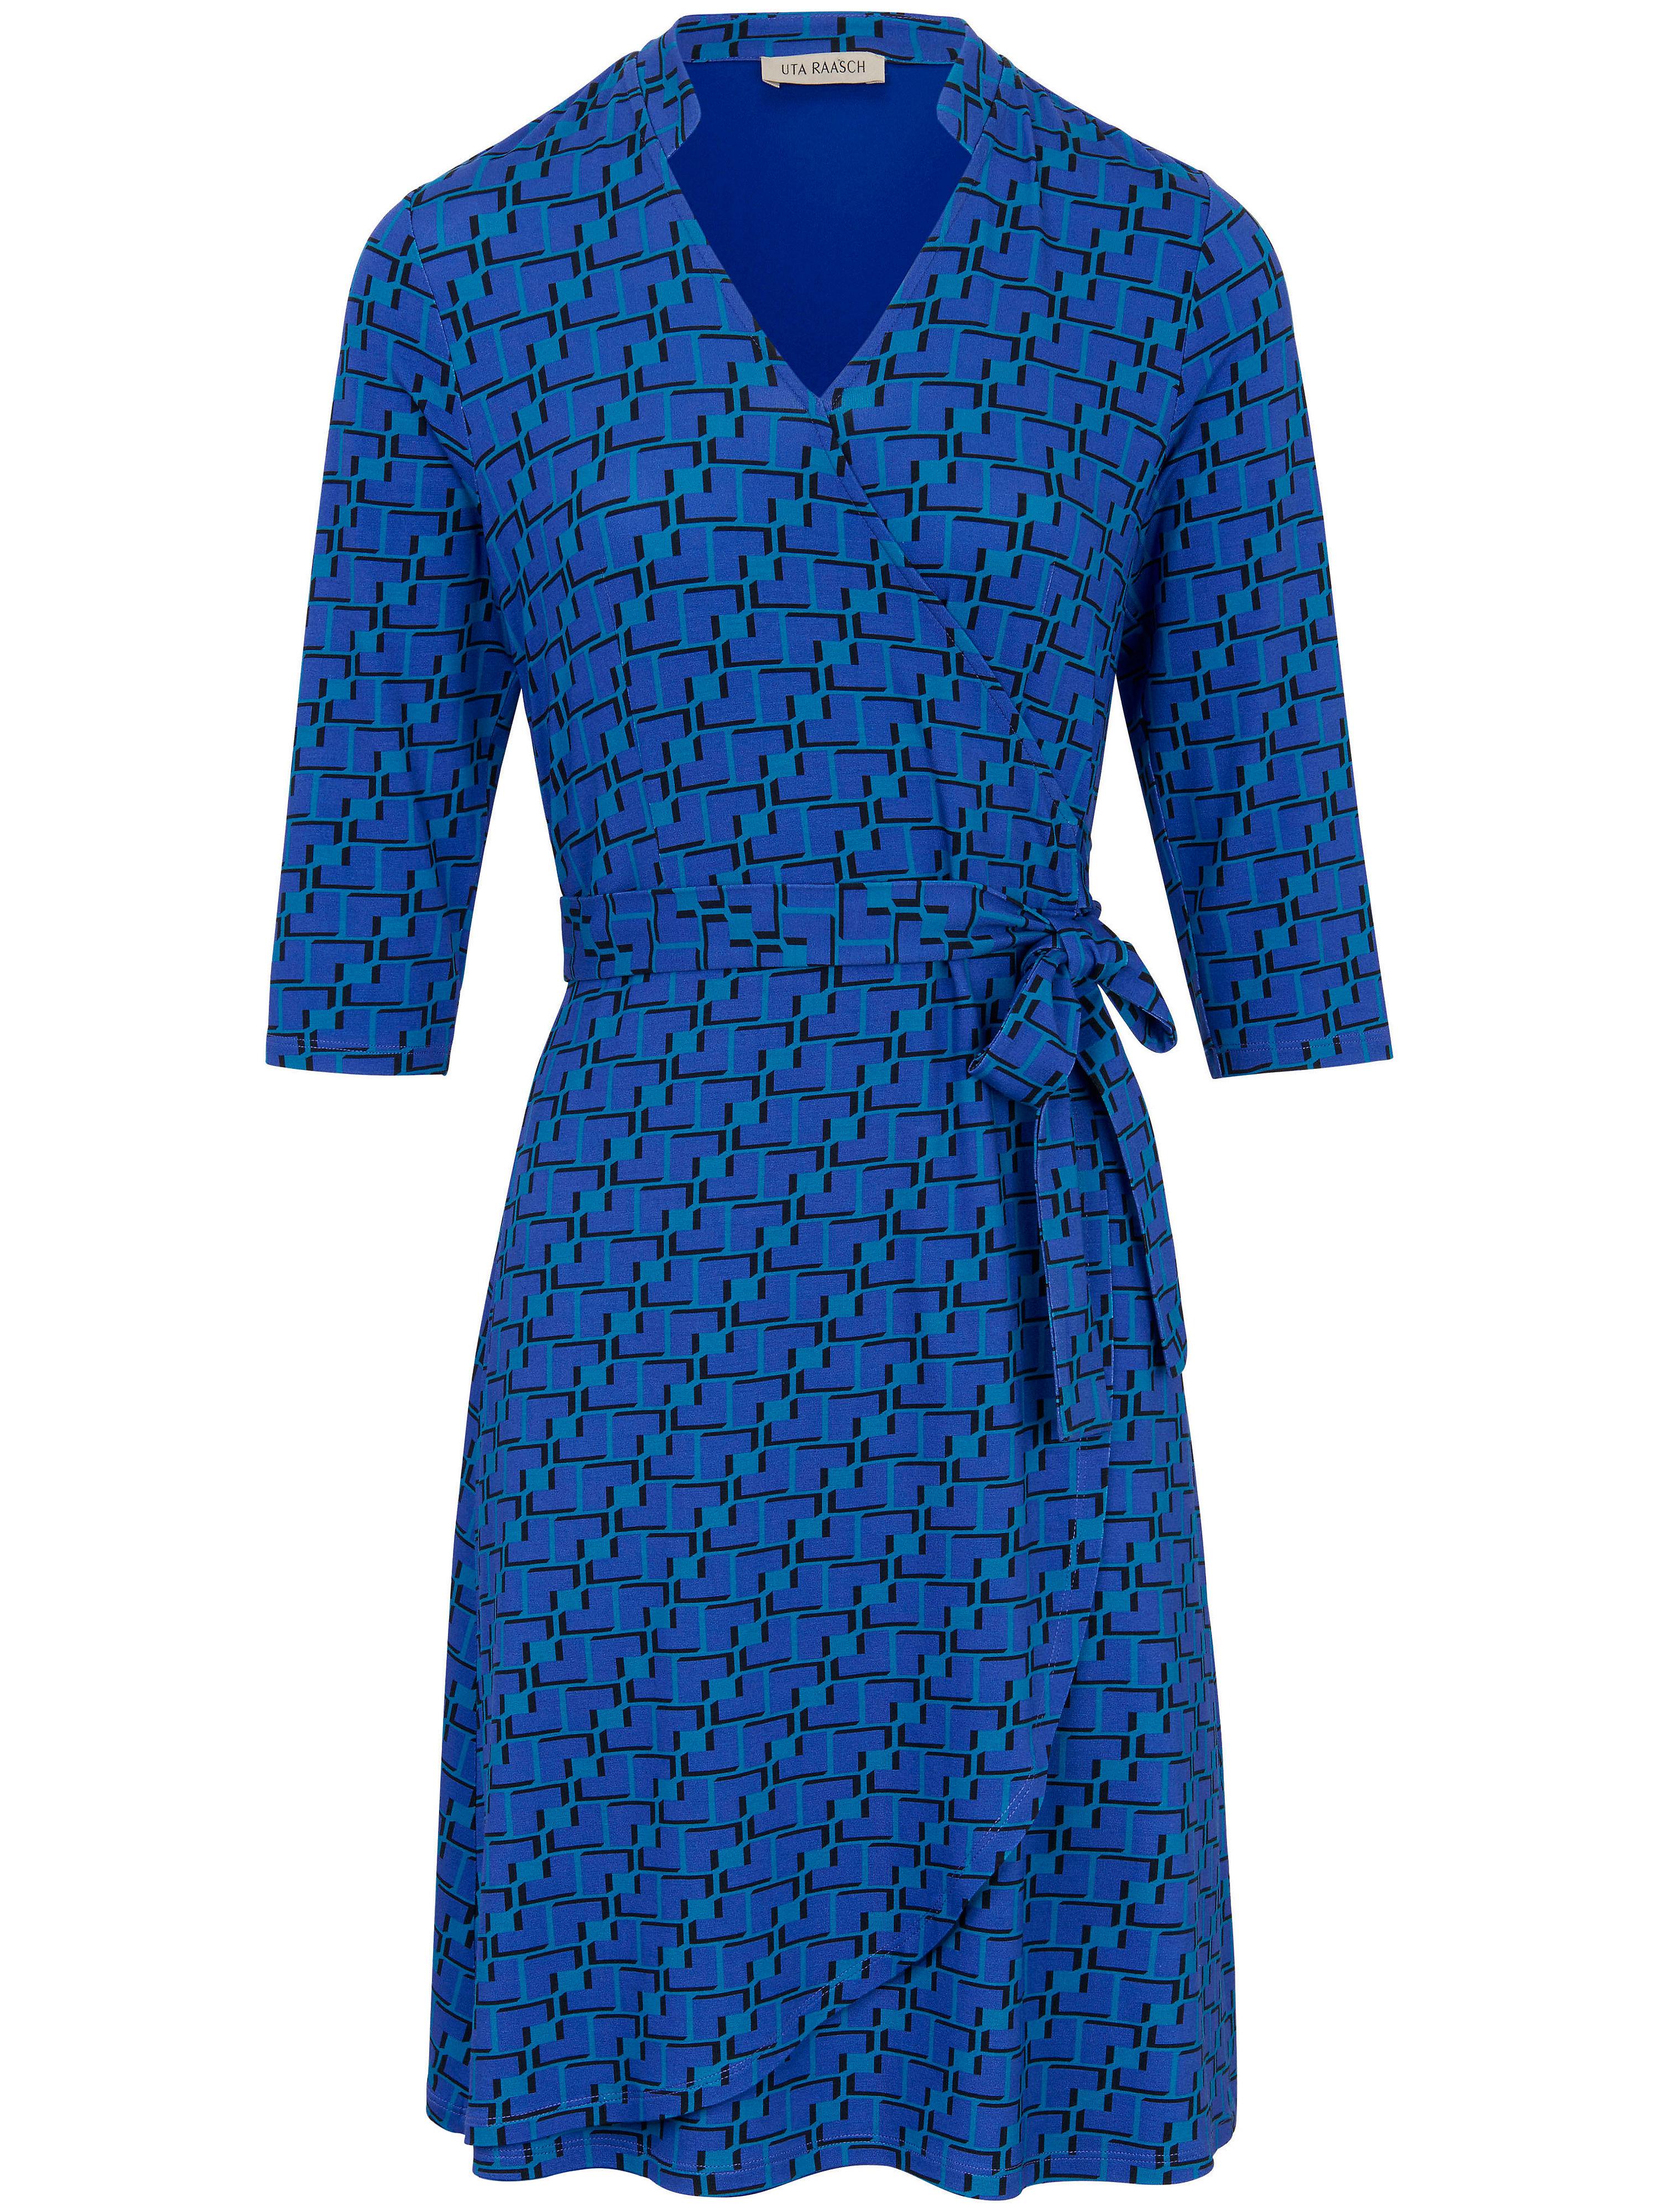 La robe imprimée jersey manches 3/4 Uta Raasch multicolore taille 40